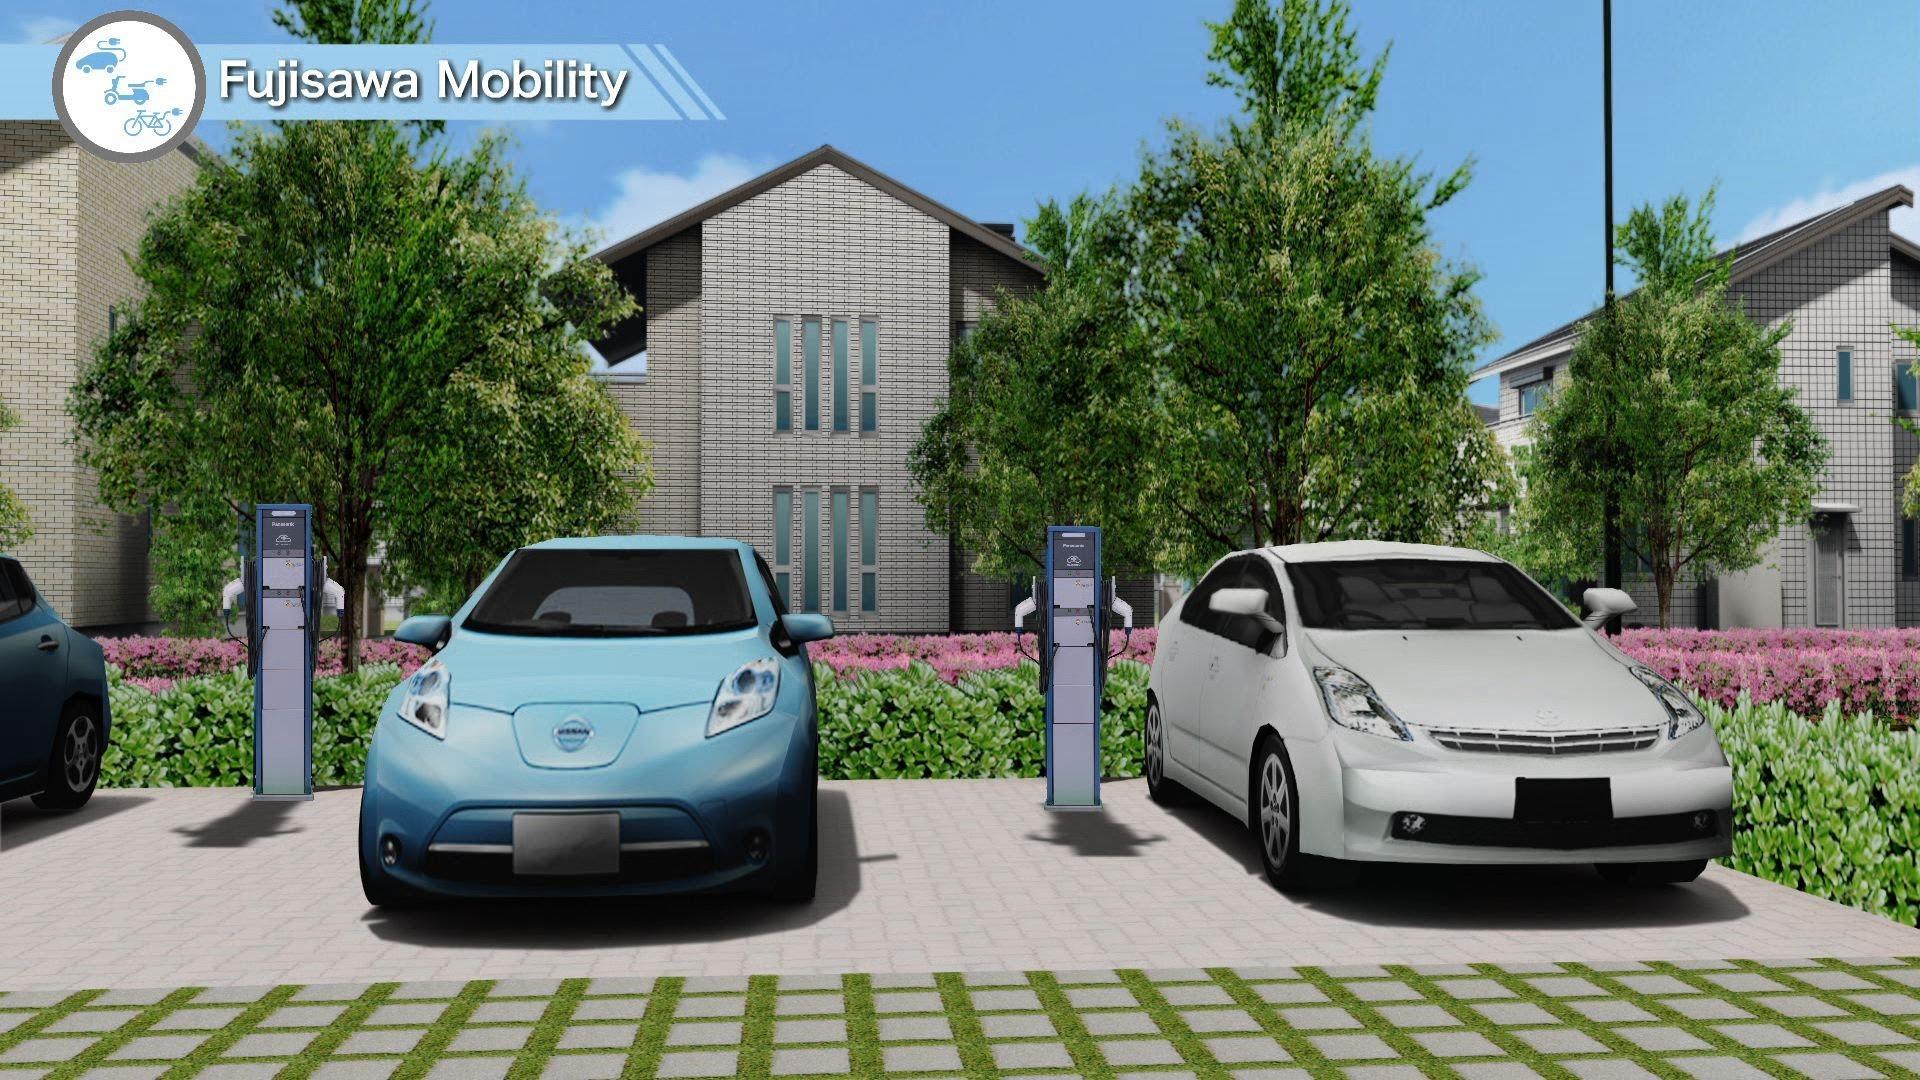 fujisawa smart town_mobility_energy-mag